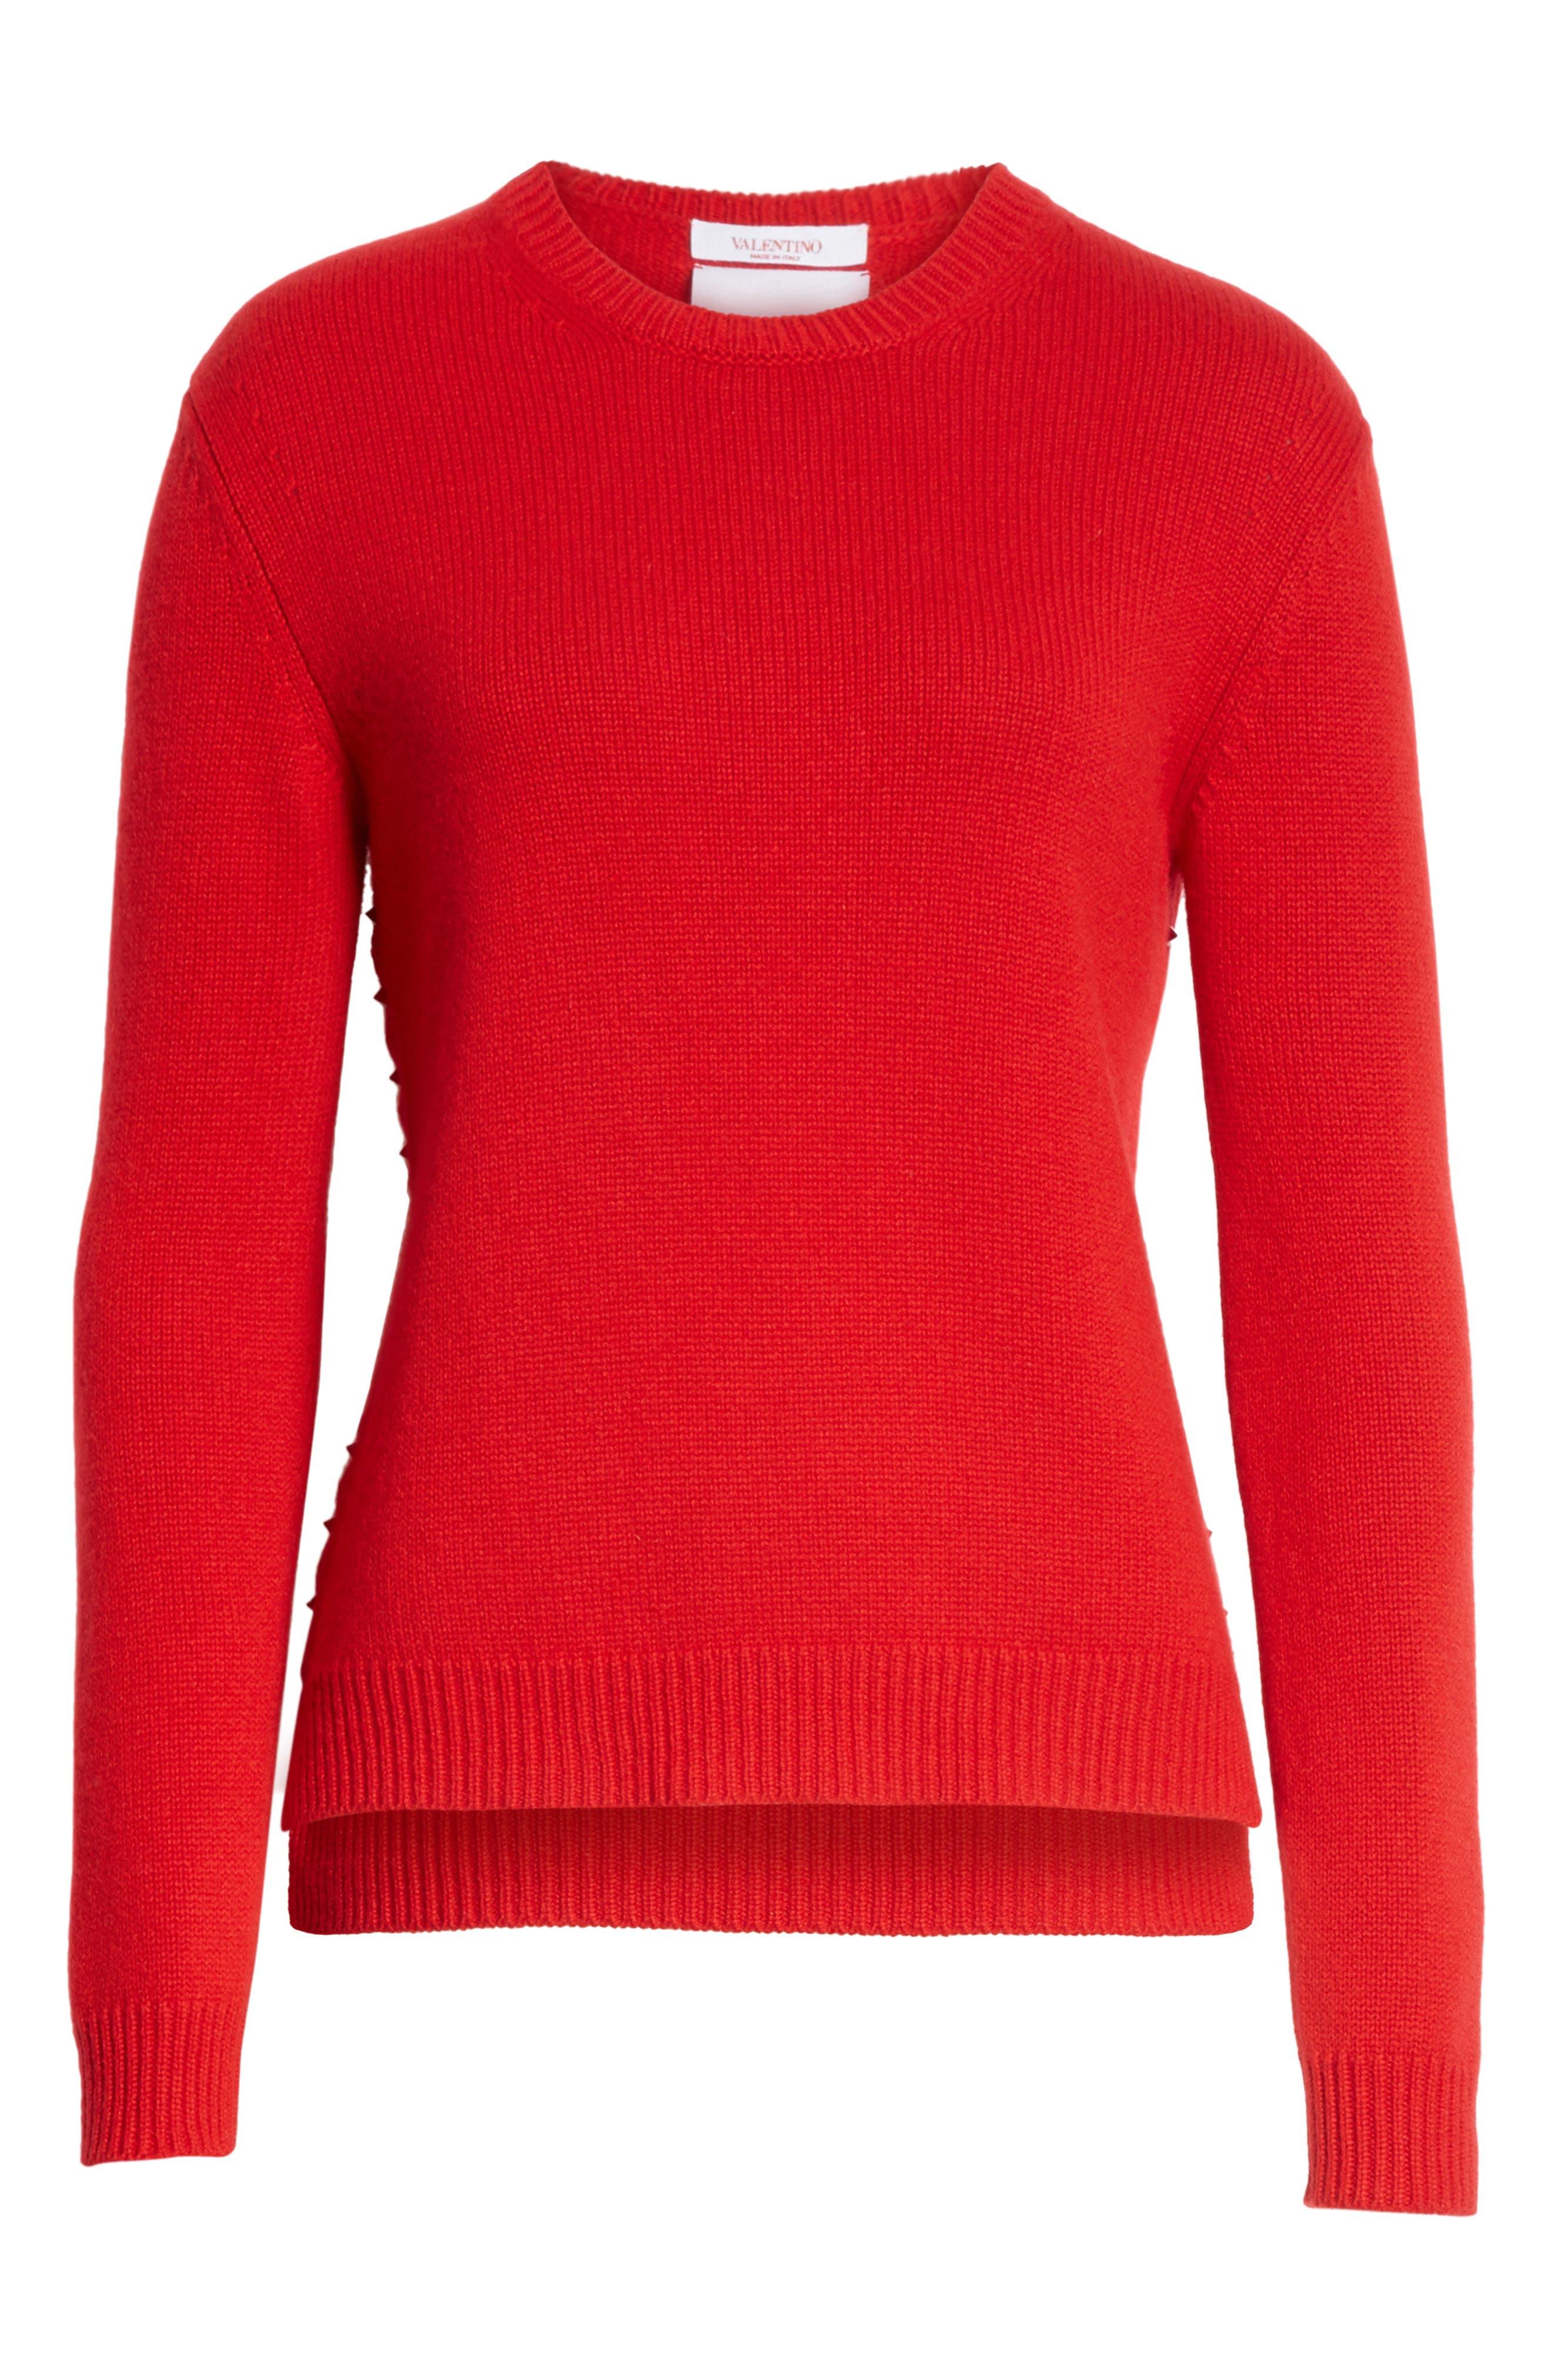 Rockstud Cashmere Sweater,                             Alternate thumbnail 6, color,                             610